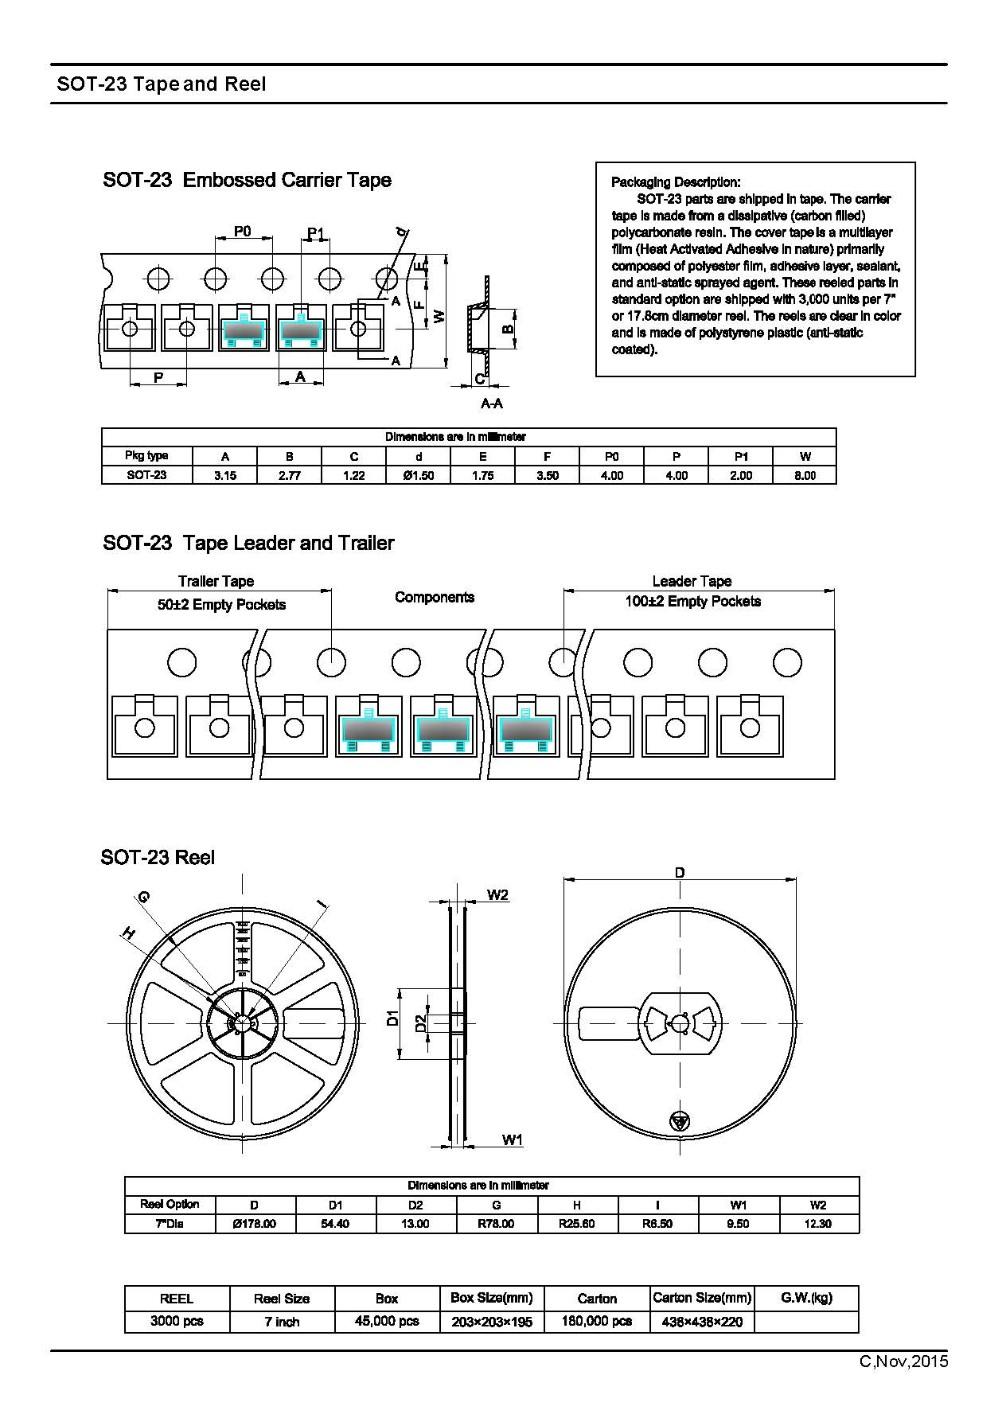 G1 S8050 Transistor Equivalent General Pnp Npn Transistor